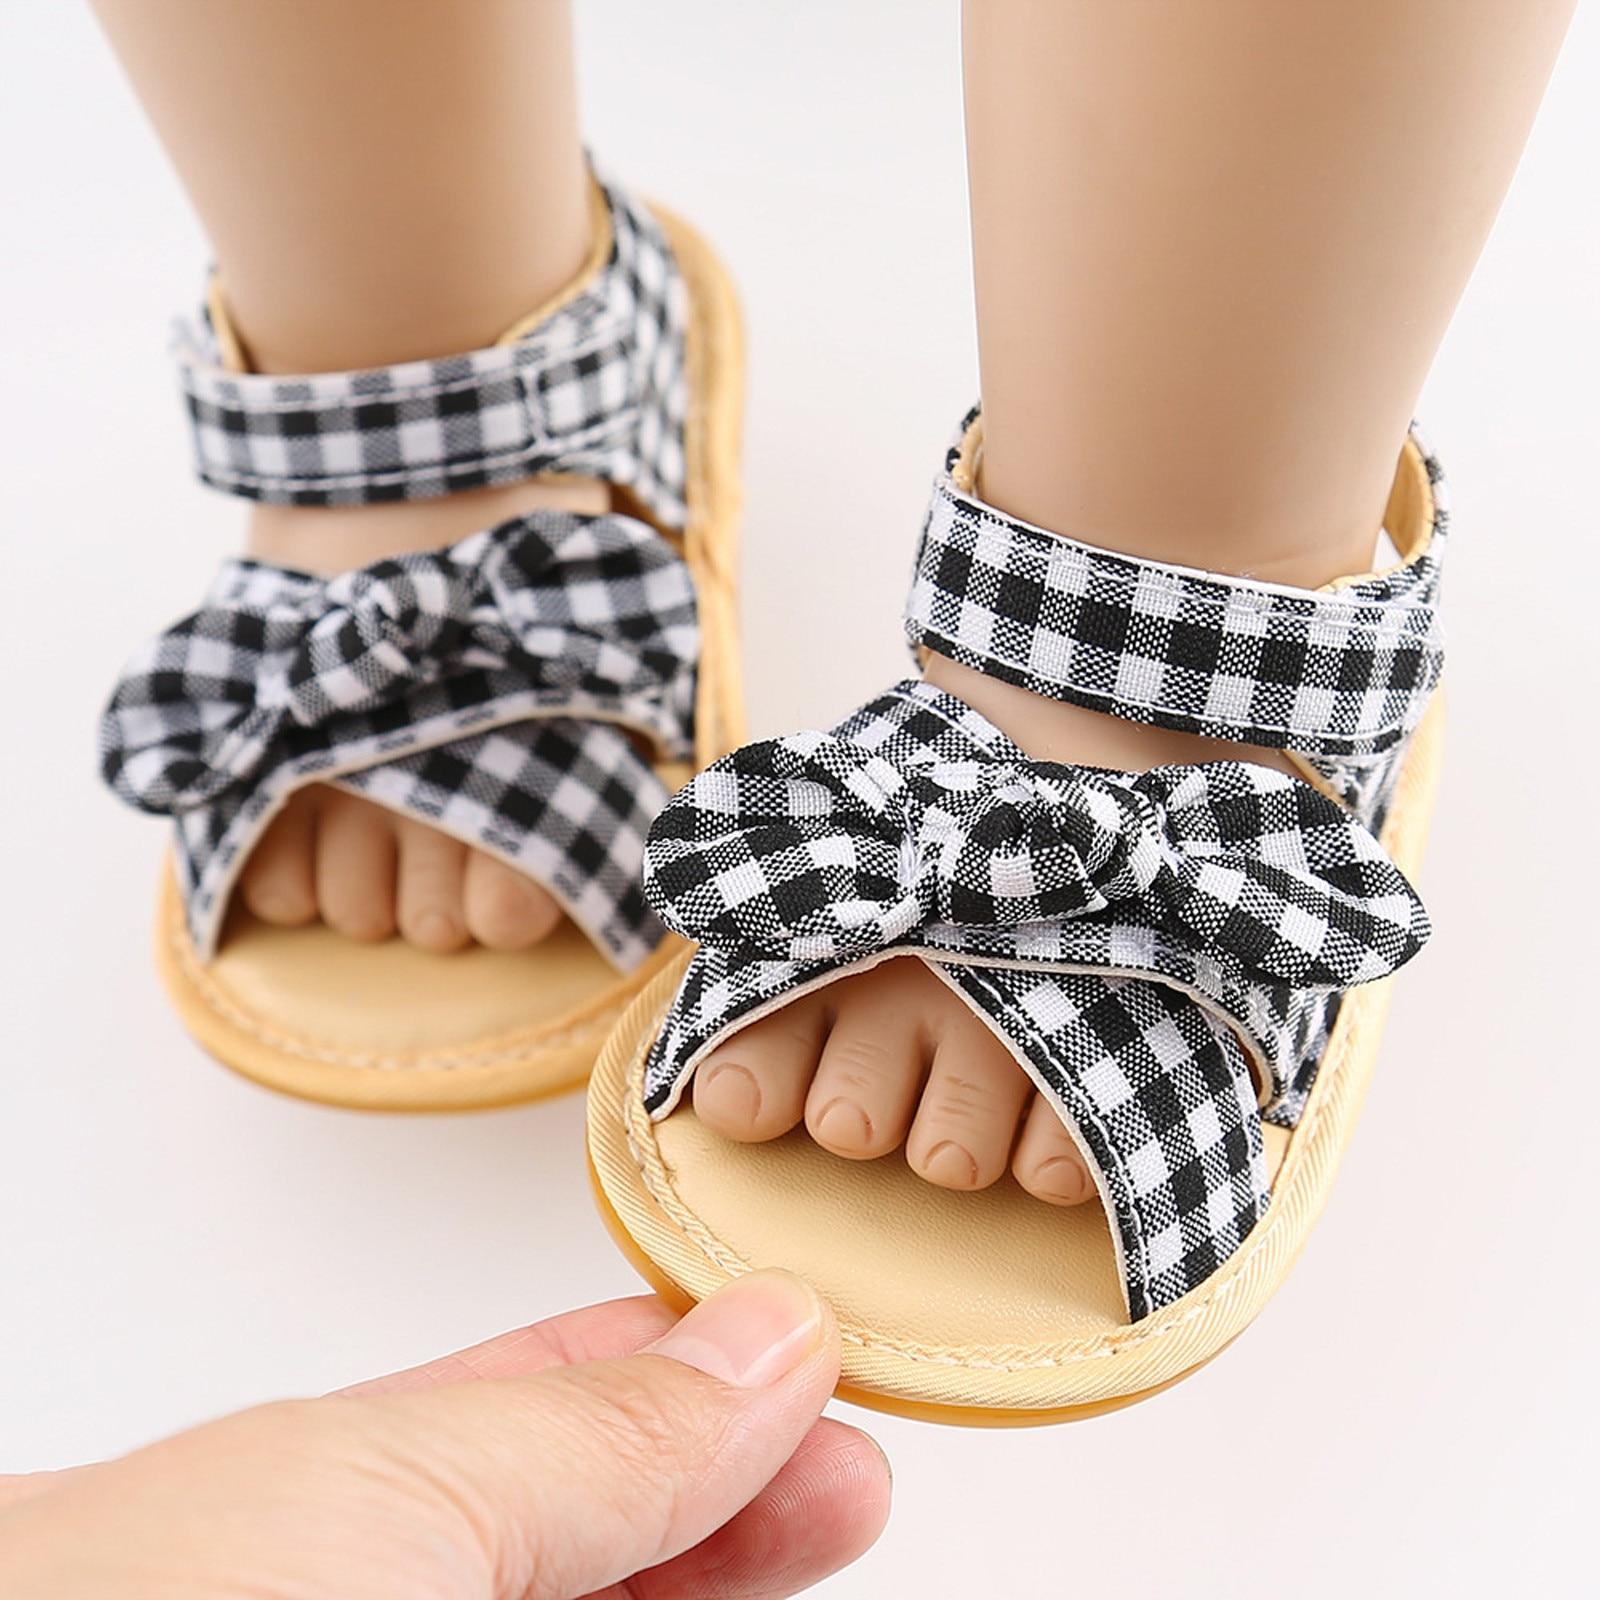 Infant Boys And Girls Plaid Sandals Non-slip Rubber Sole Summer Flat Shoes Soft Sole Sandals First Walking Shoes обувь для детей